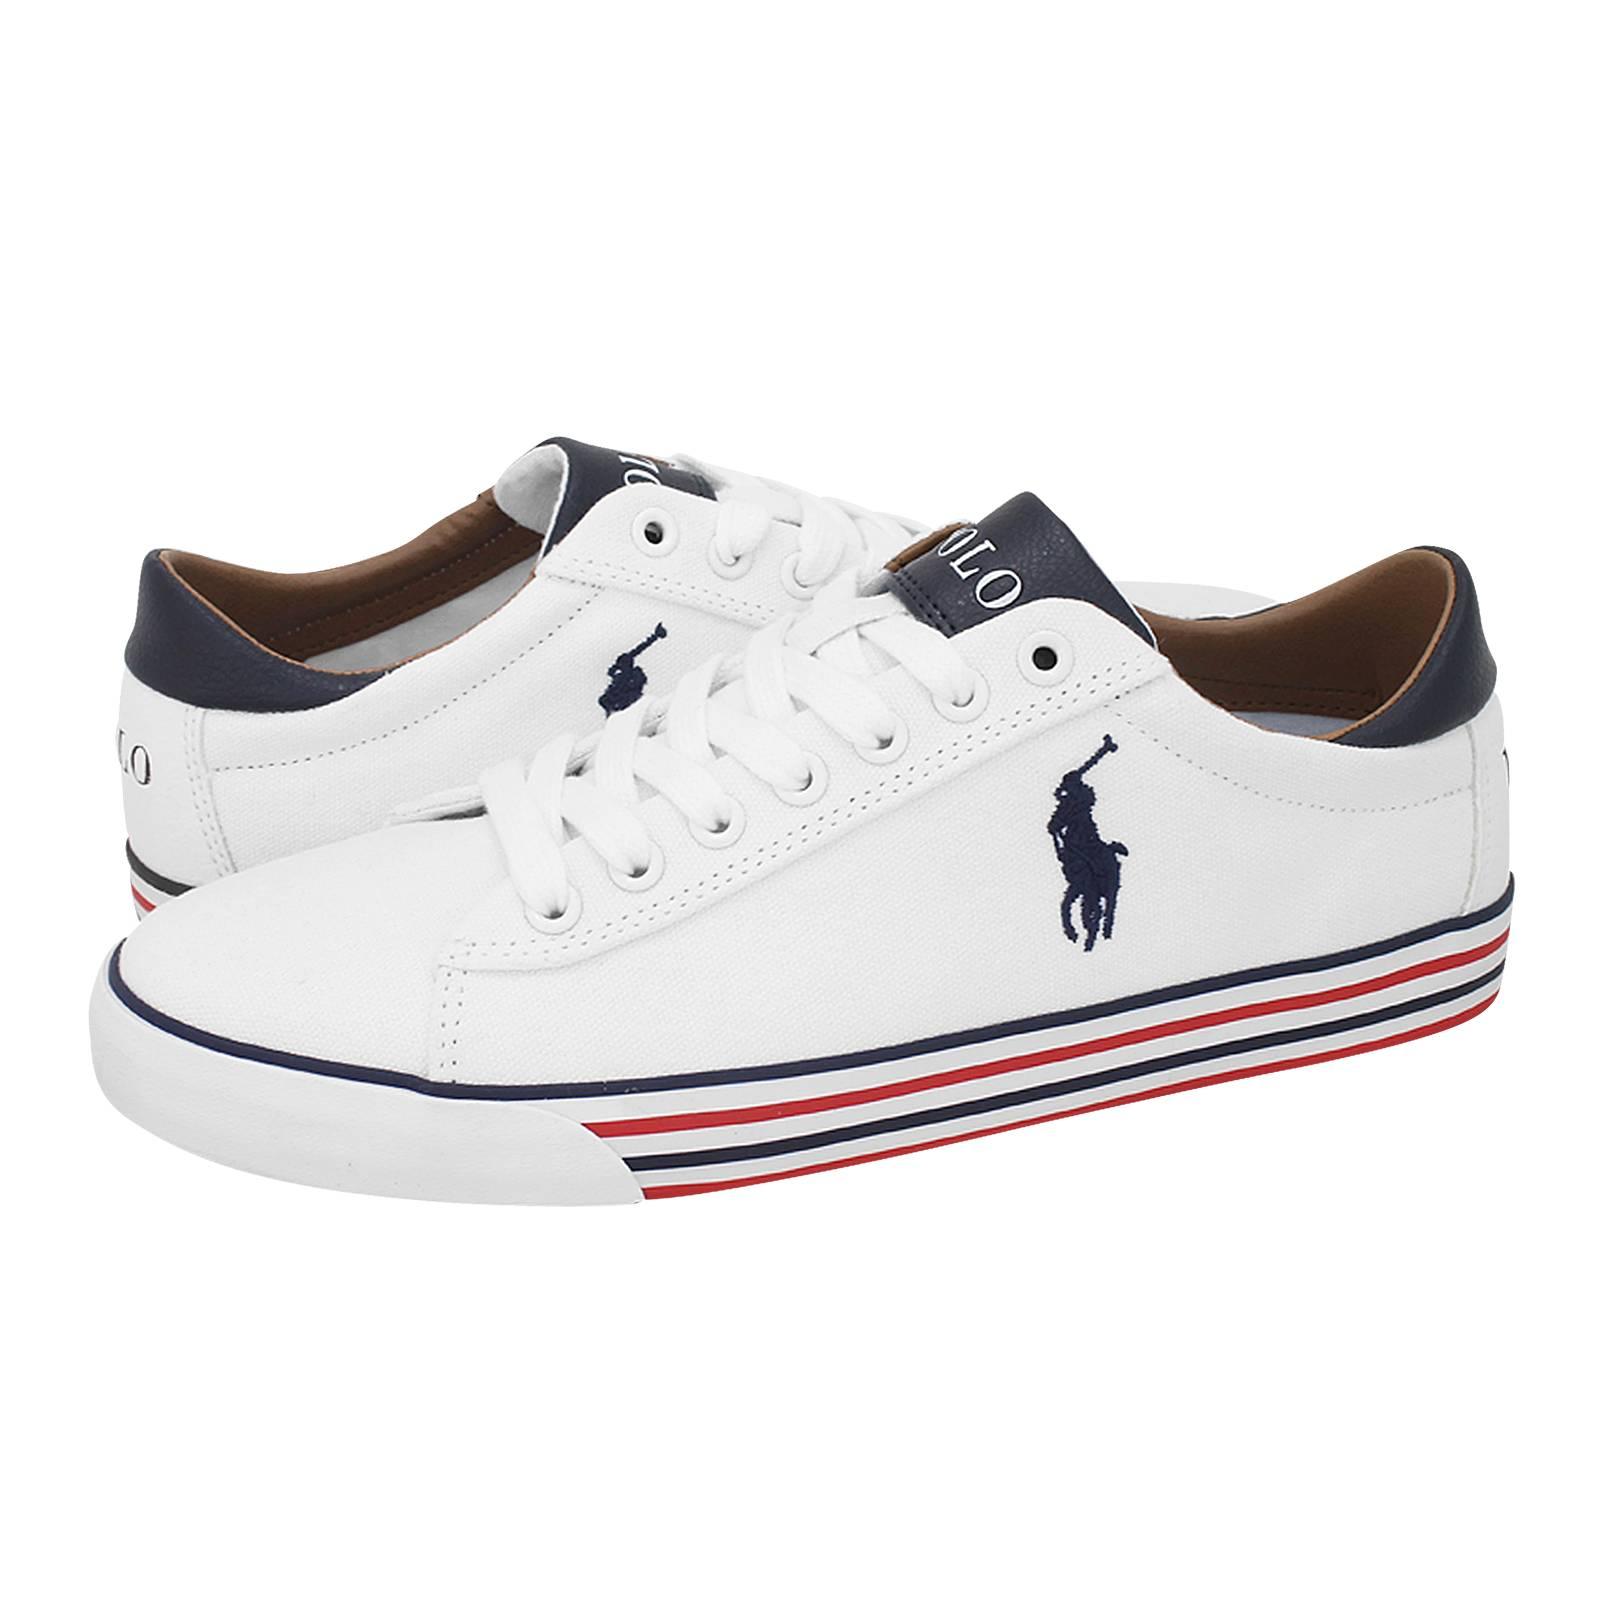 polo ralph lauren casual shoes